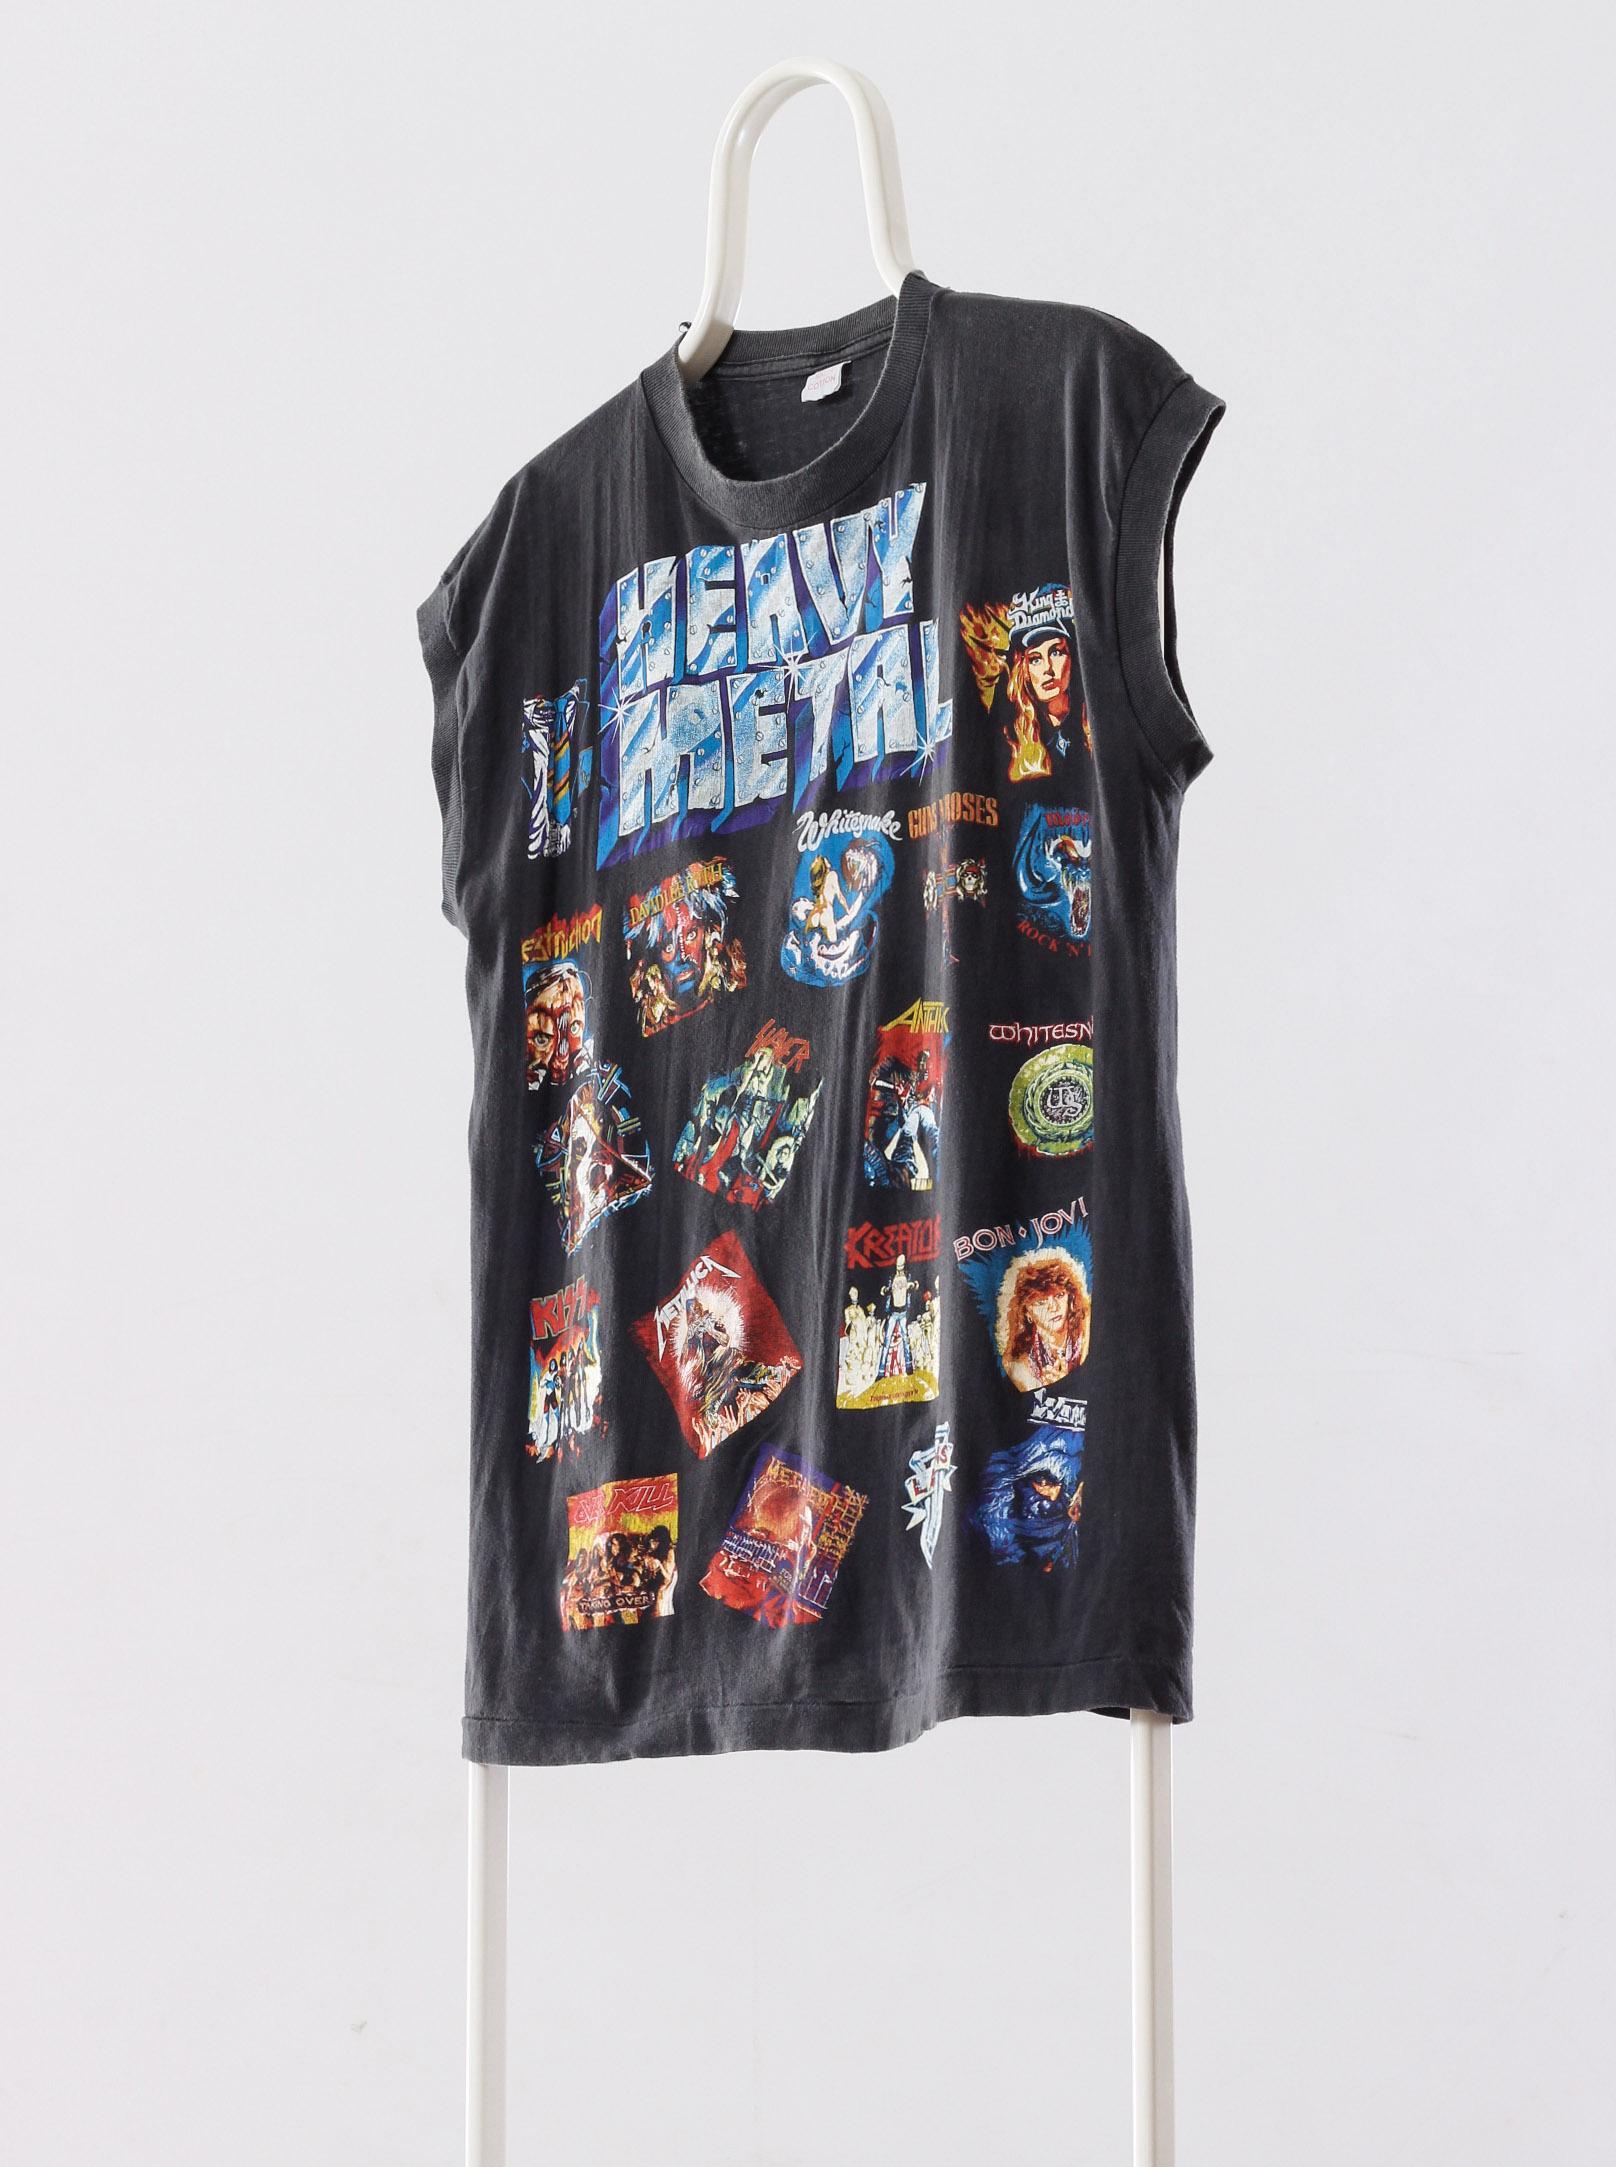 5dc9cc0353fd53 Vintage × Band Tees ×. A1190TSM - 90 s Vintage Mens HEAVY METAL Sleeveles Graphic  Tank Top T-Shirt Size ...